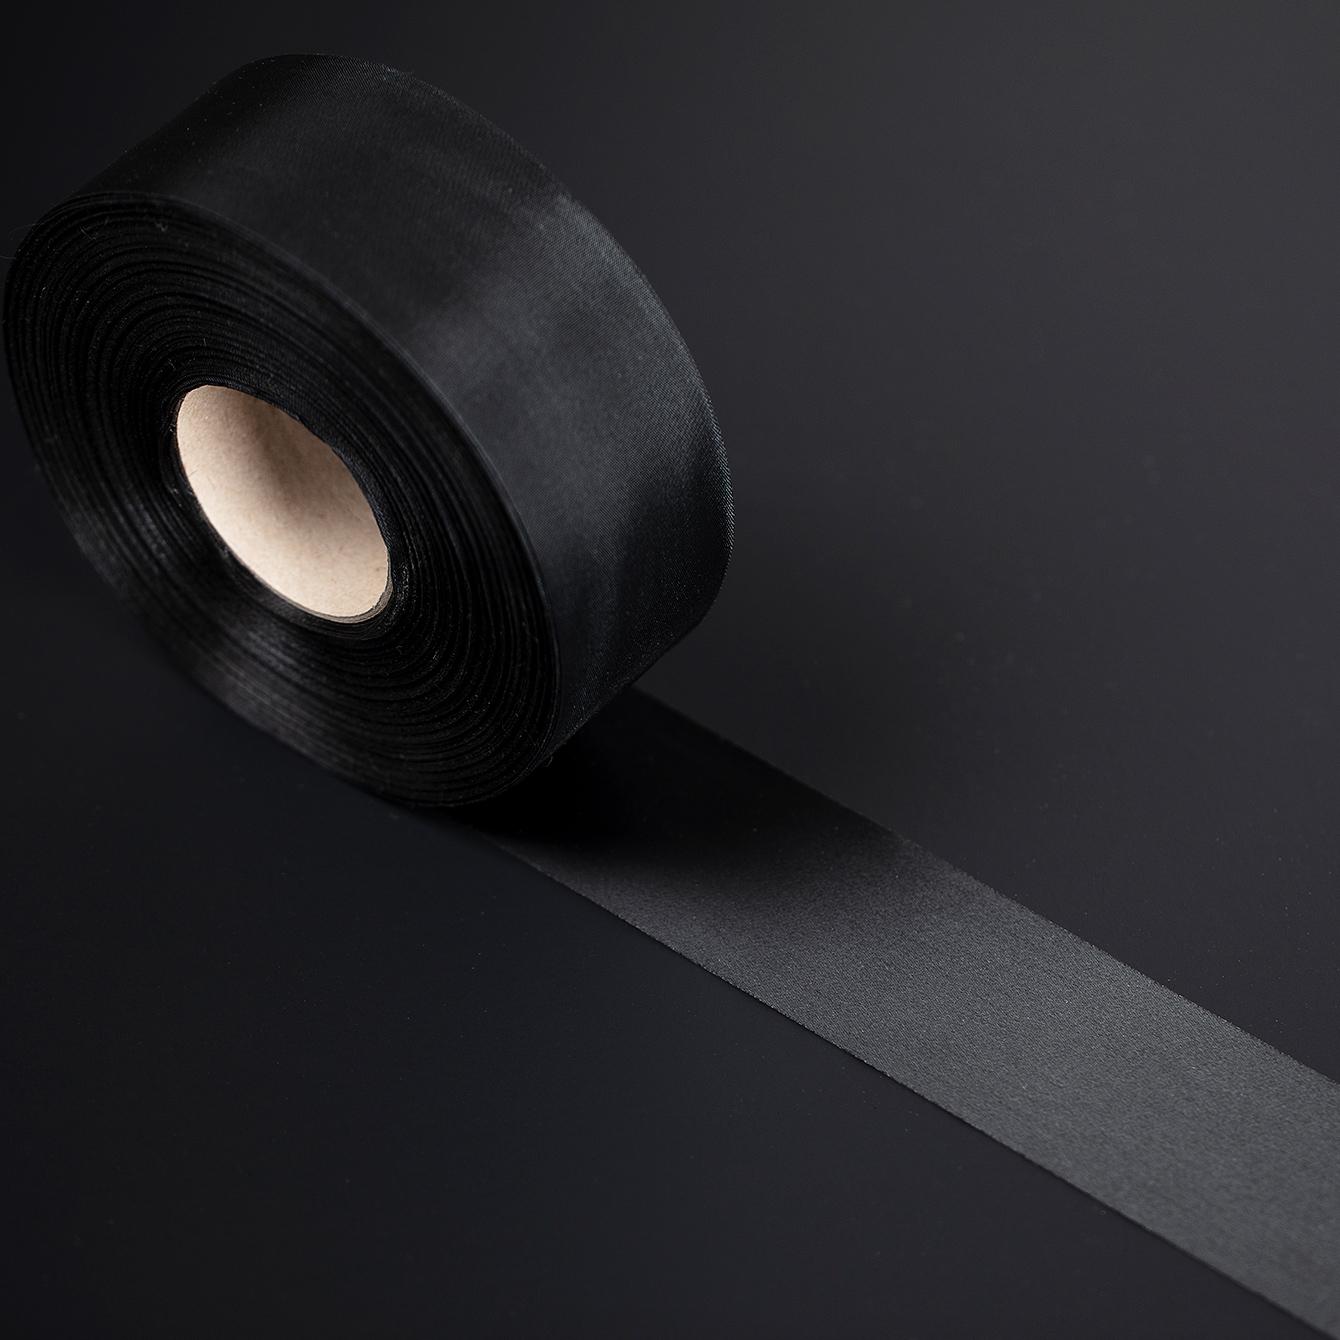 Cut and heat-slitting narrow fabric